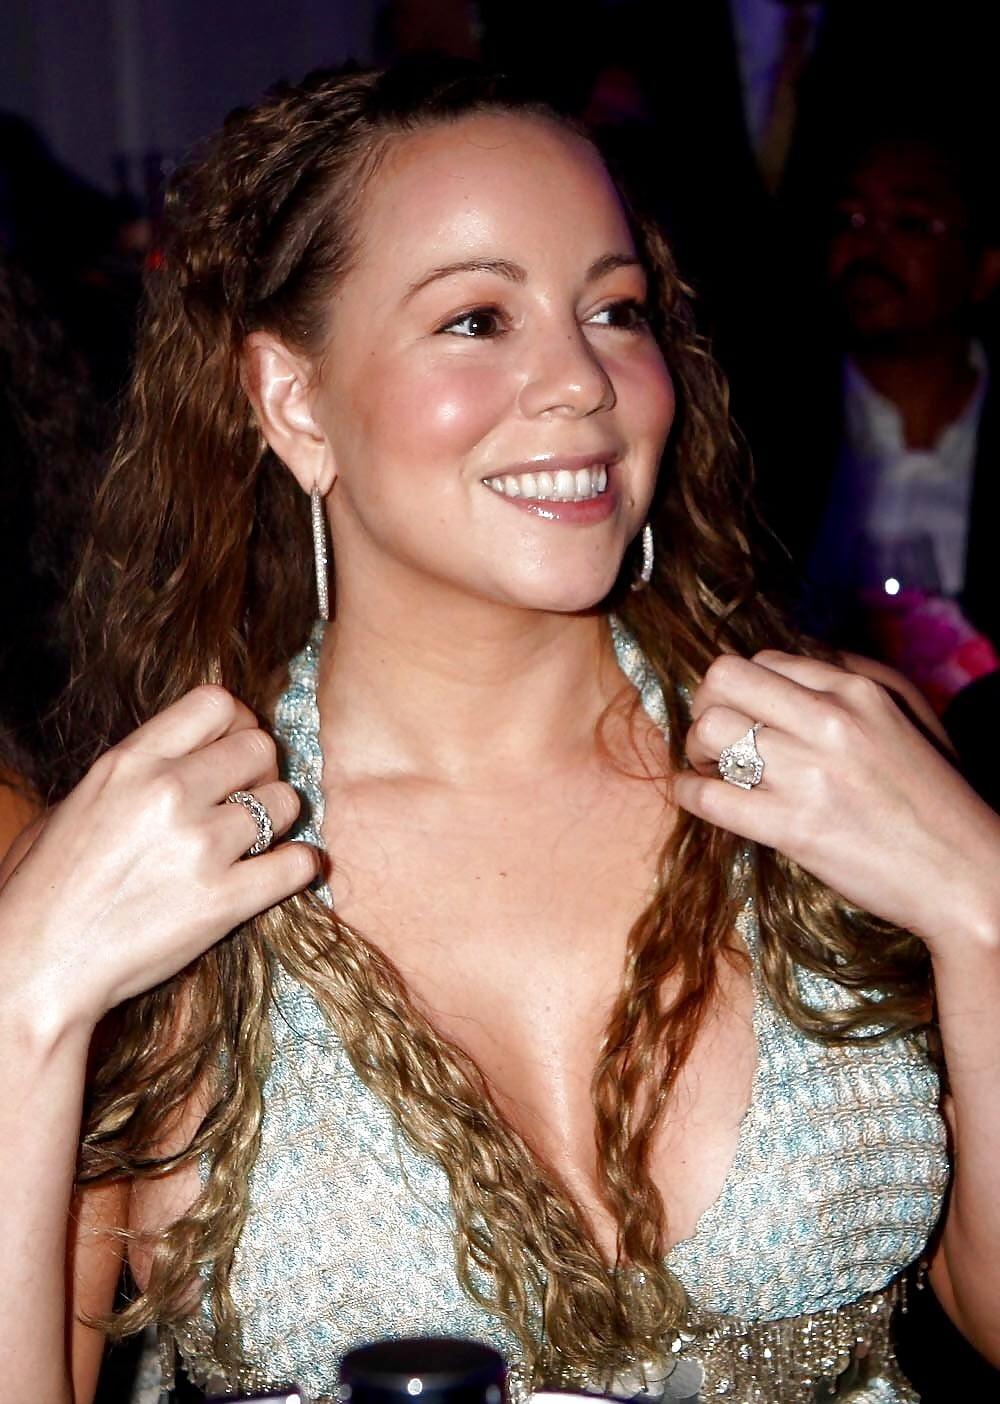 Mariah carey tgp